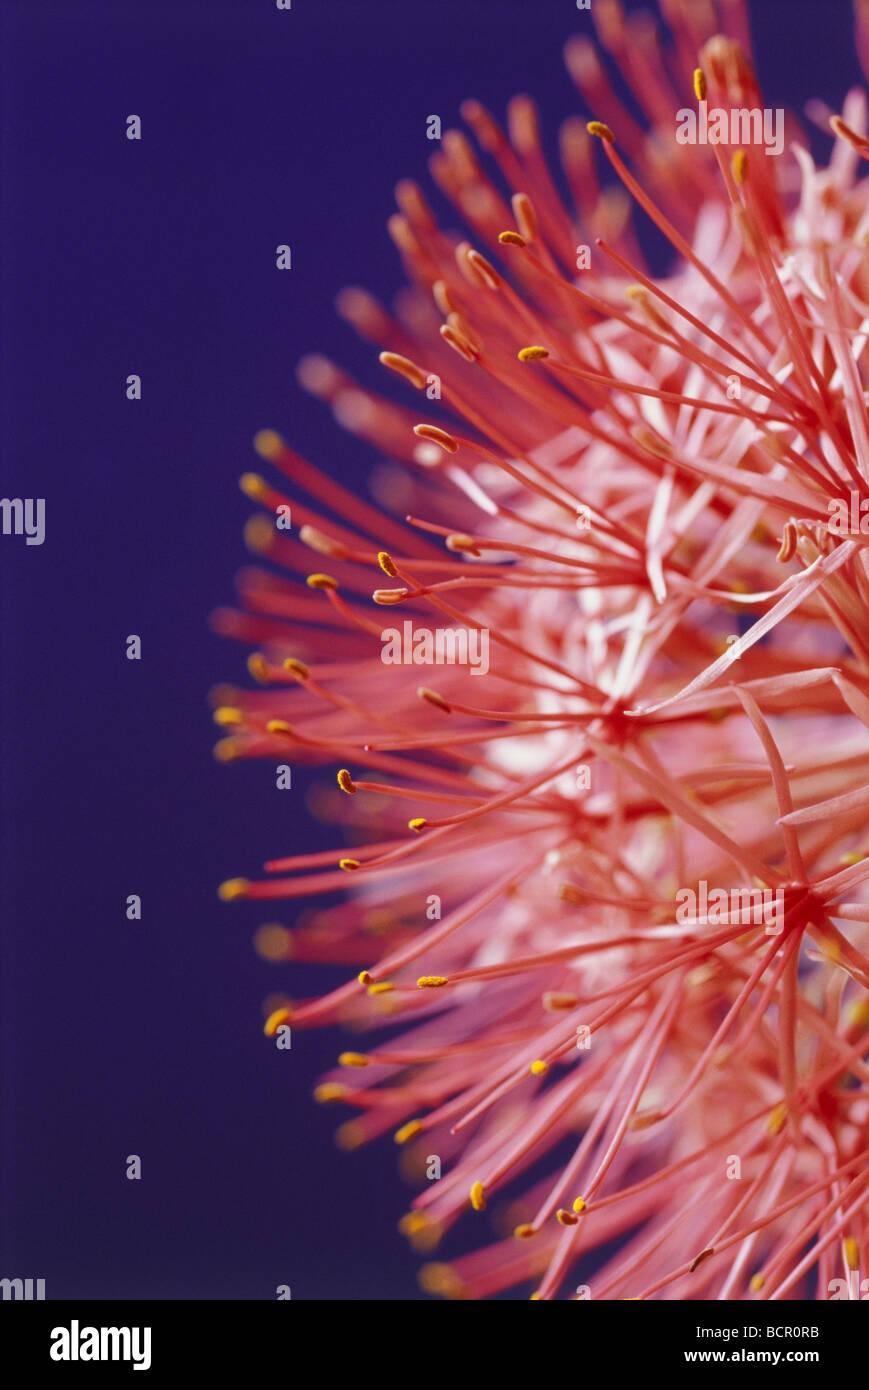 Scadoxus multiflorus, Blood lily - Stock Image